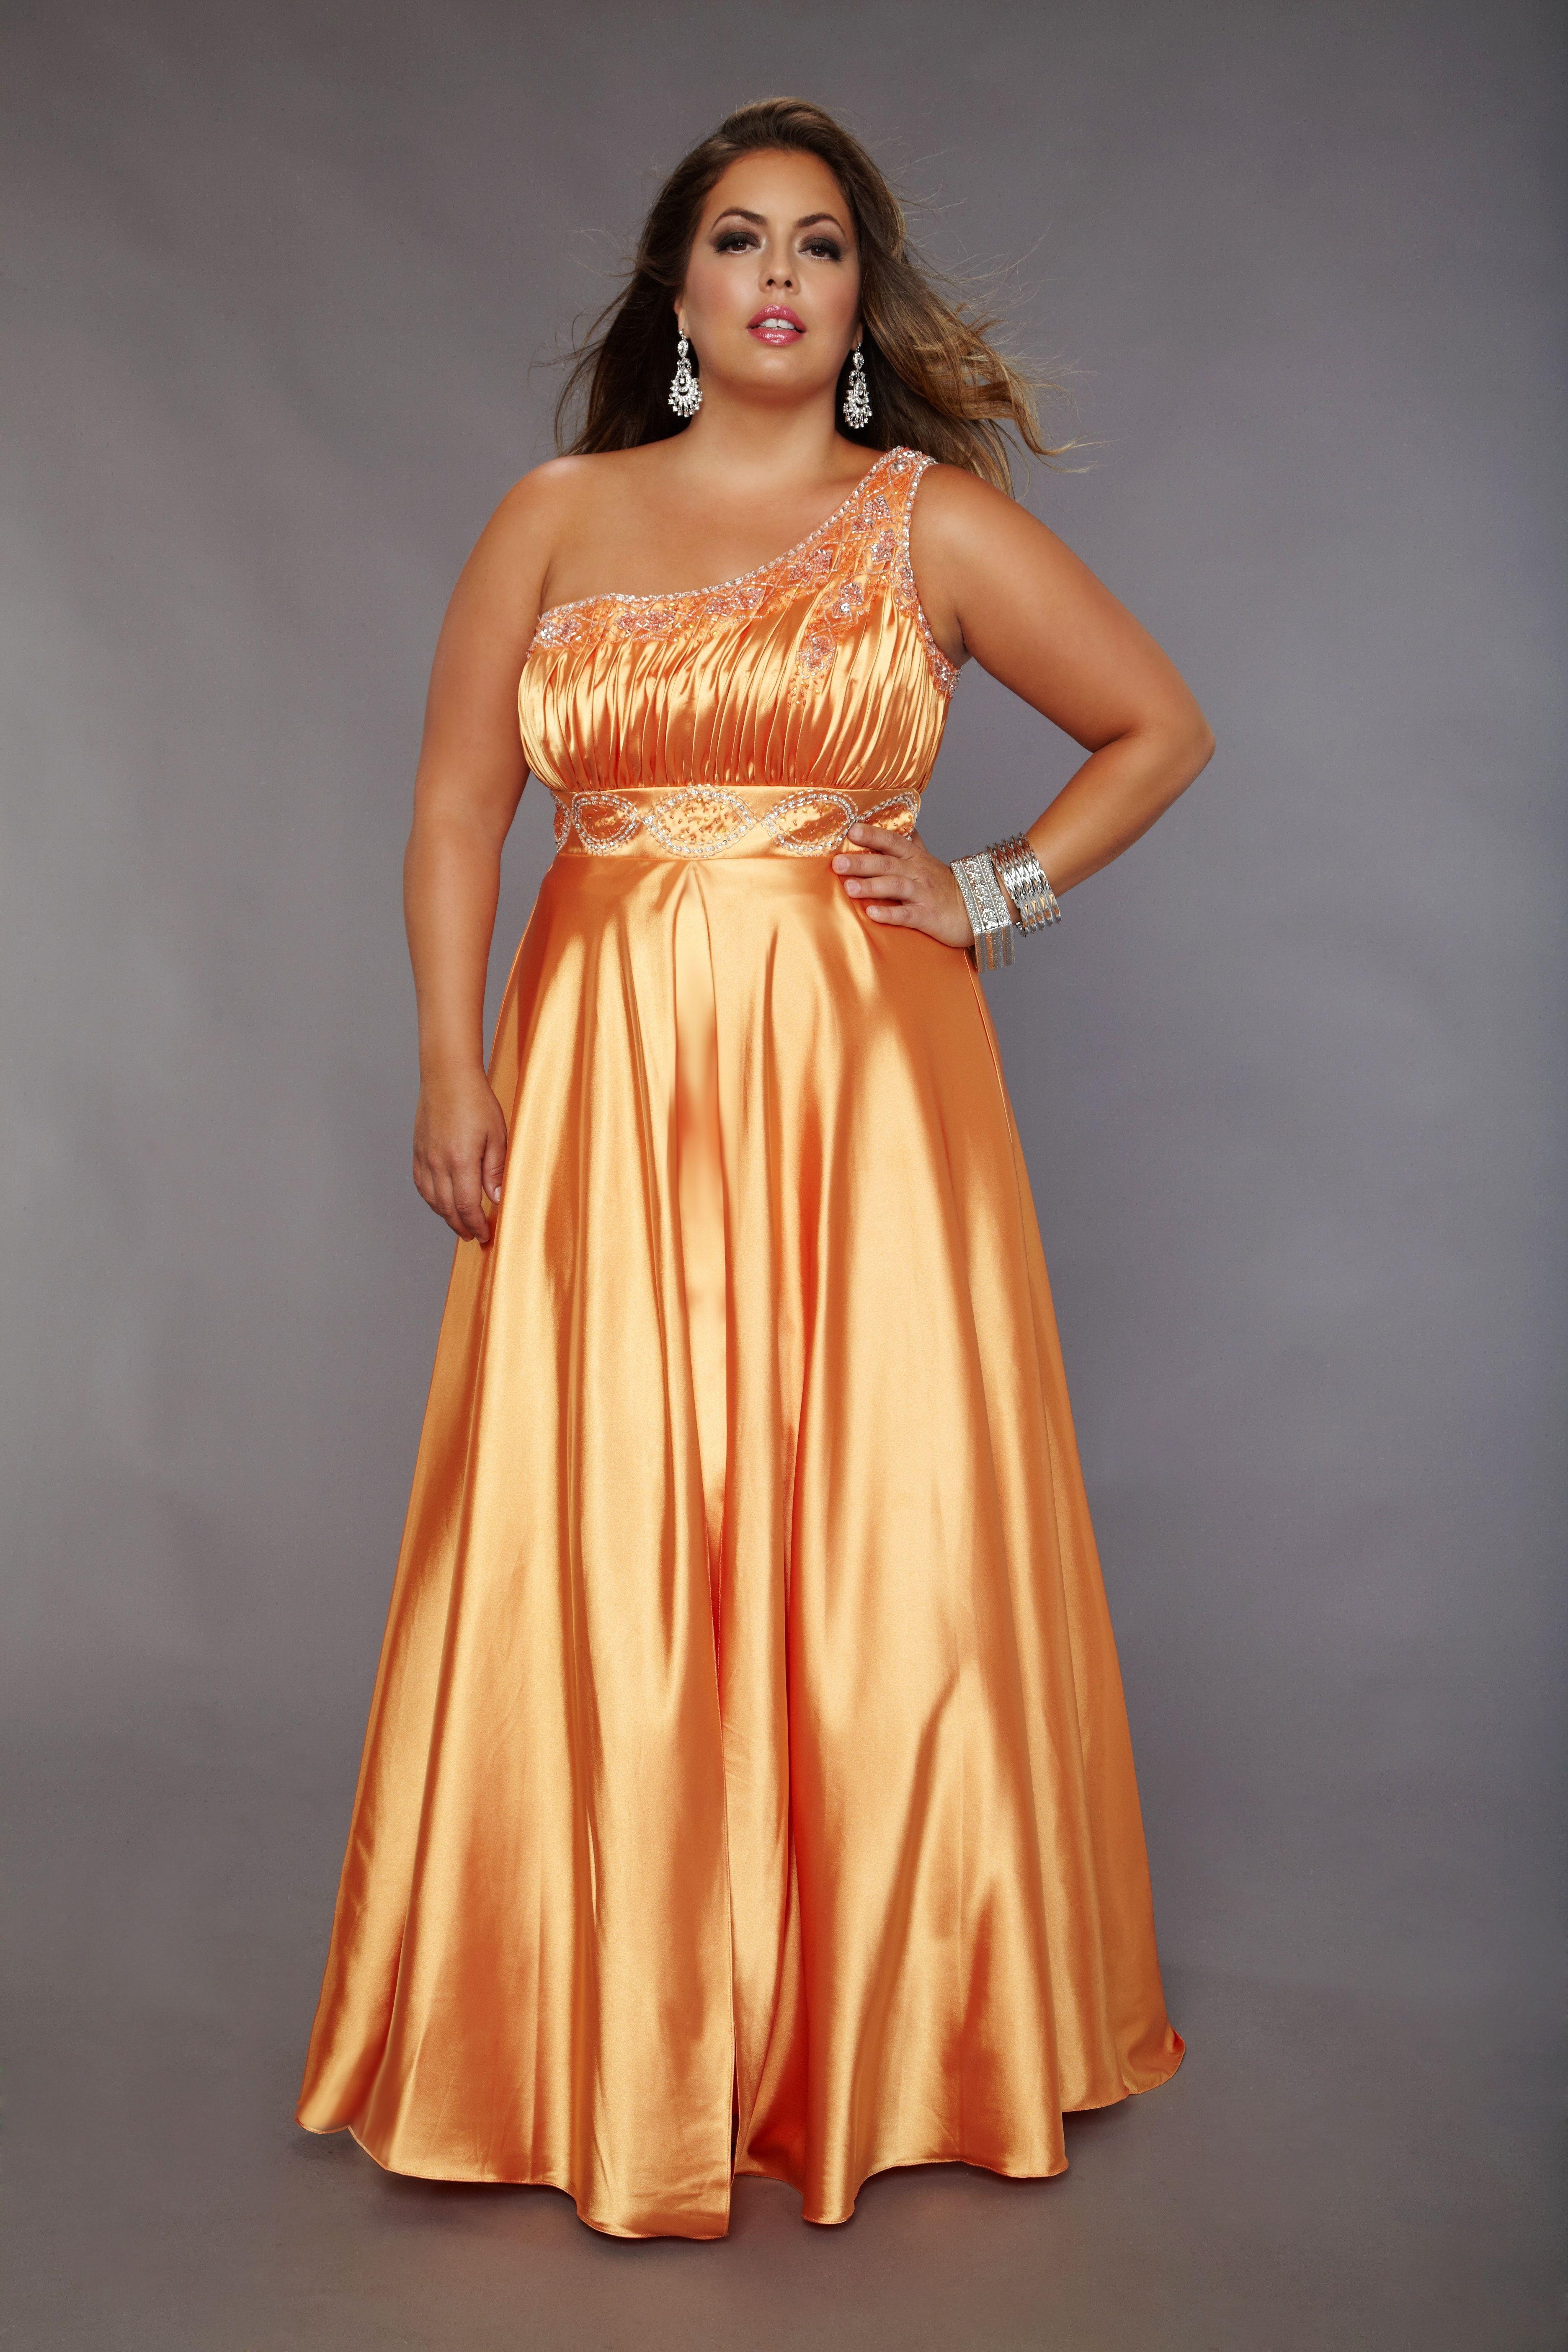 Plus Size Bridesmaid Dresses Under 100